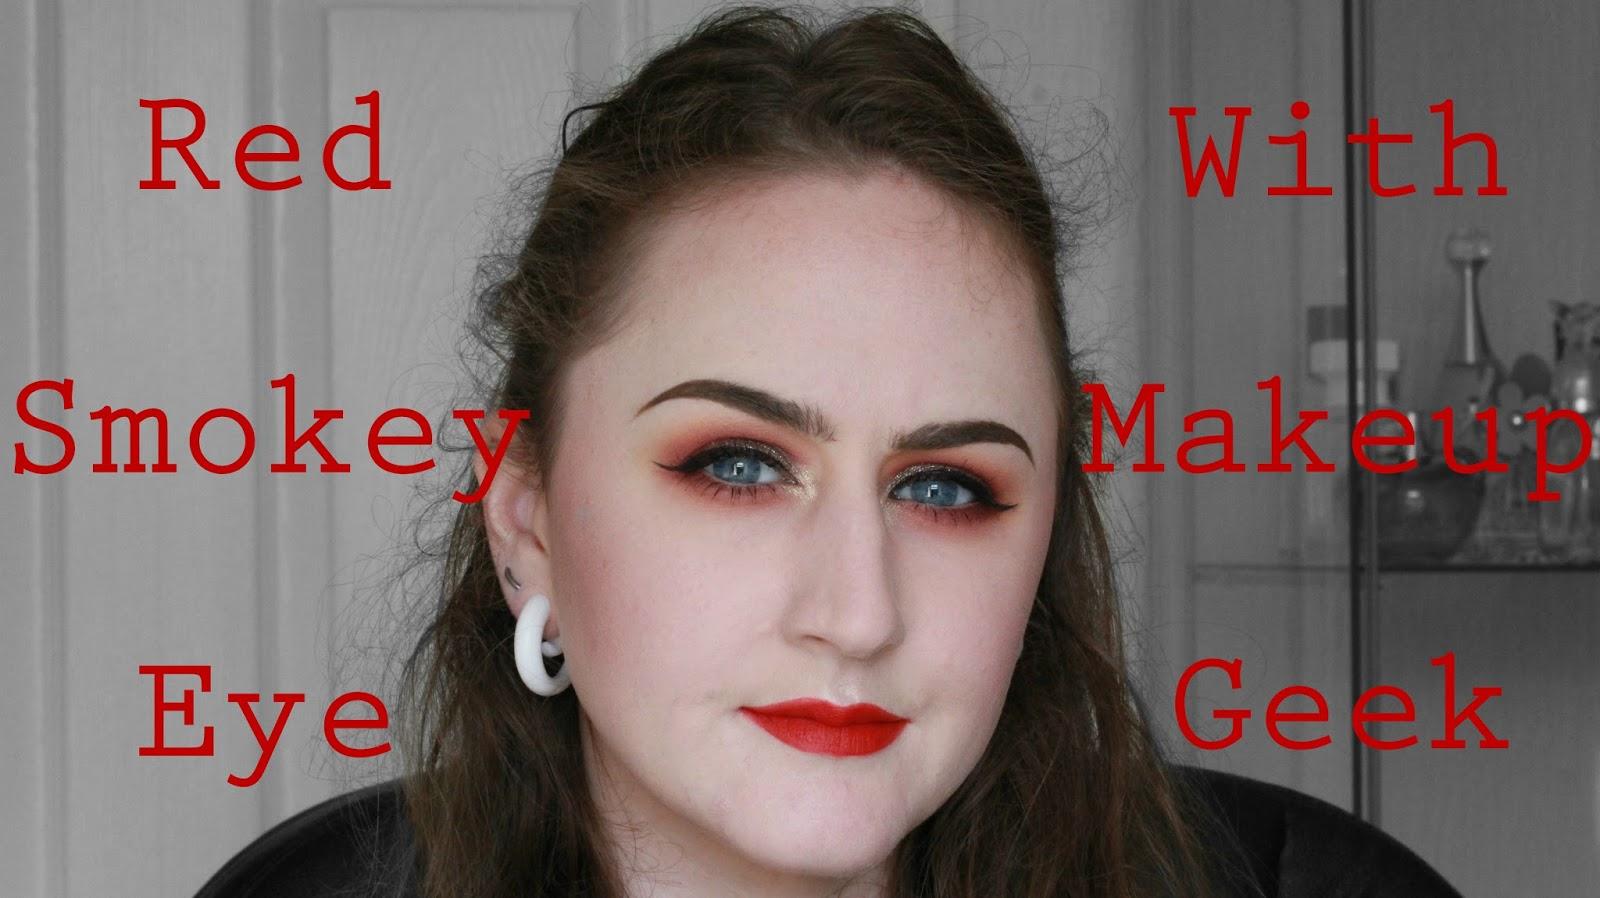 Nothing Rhymes With Rachel Red Smokey Eye With Makeup Geek